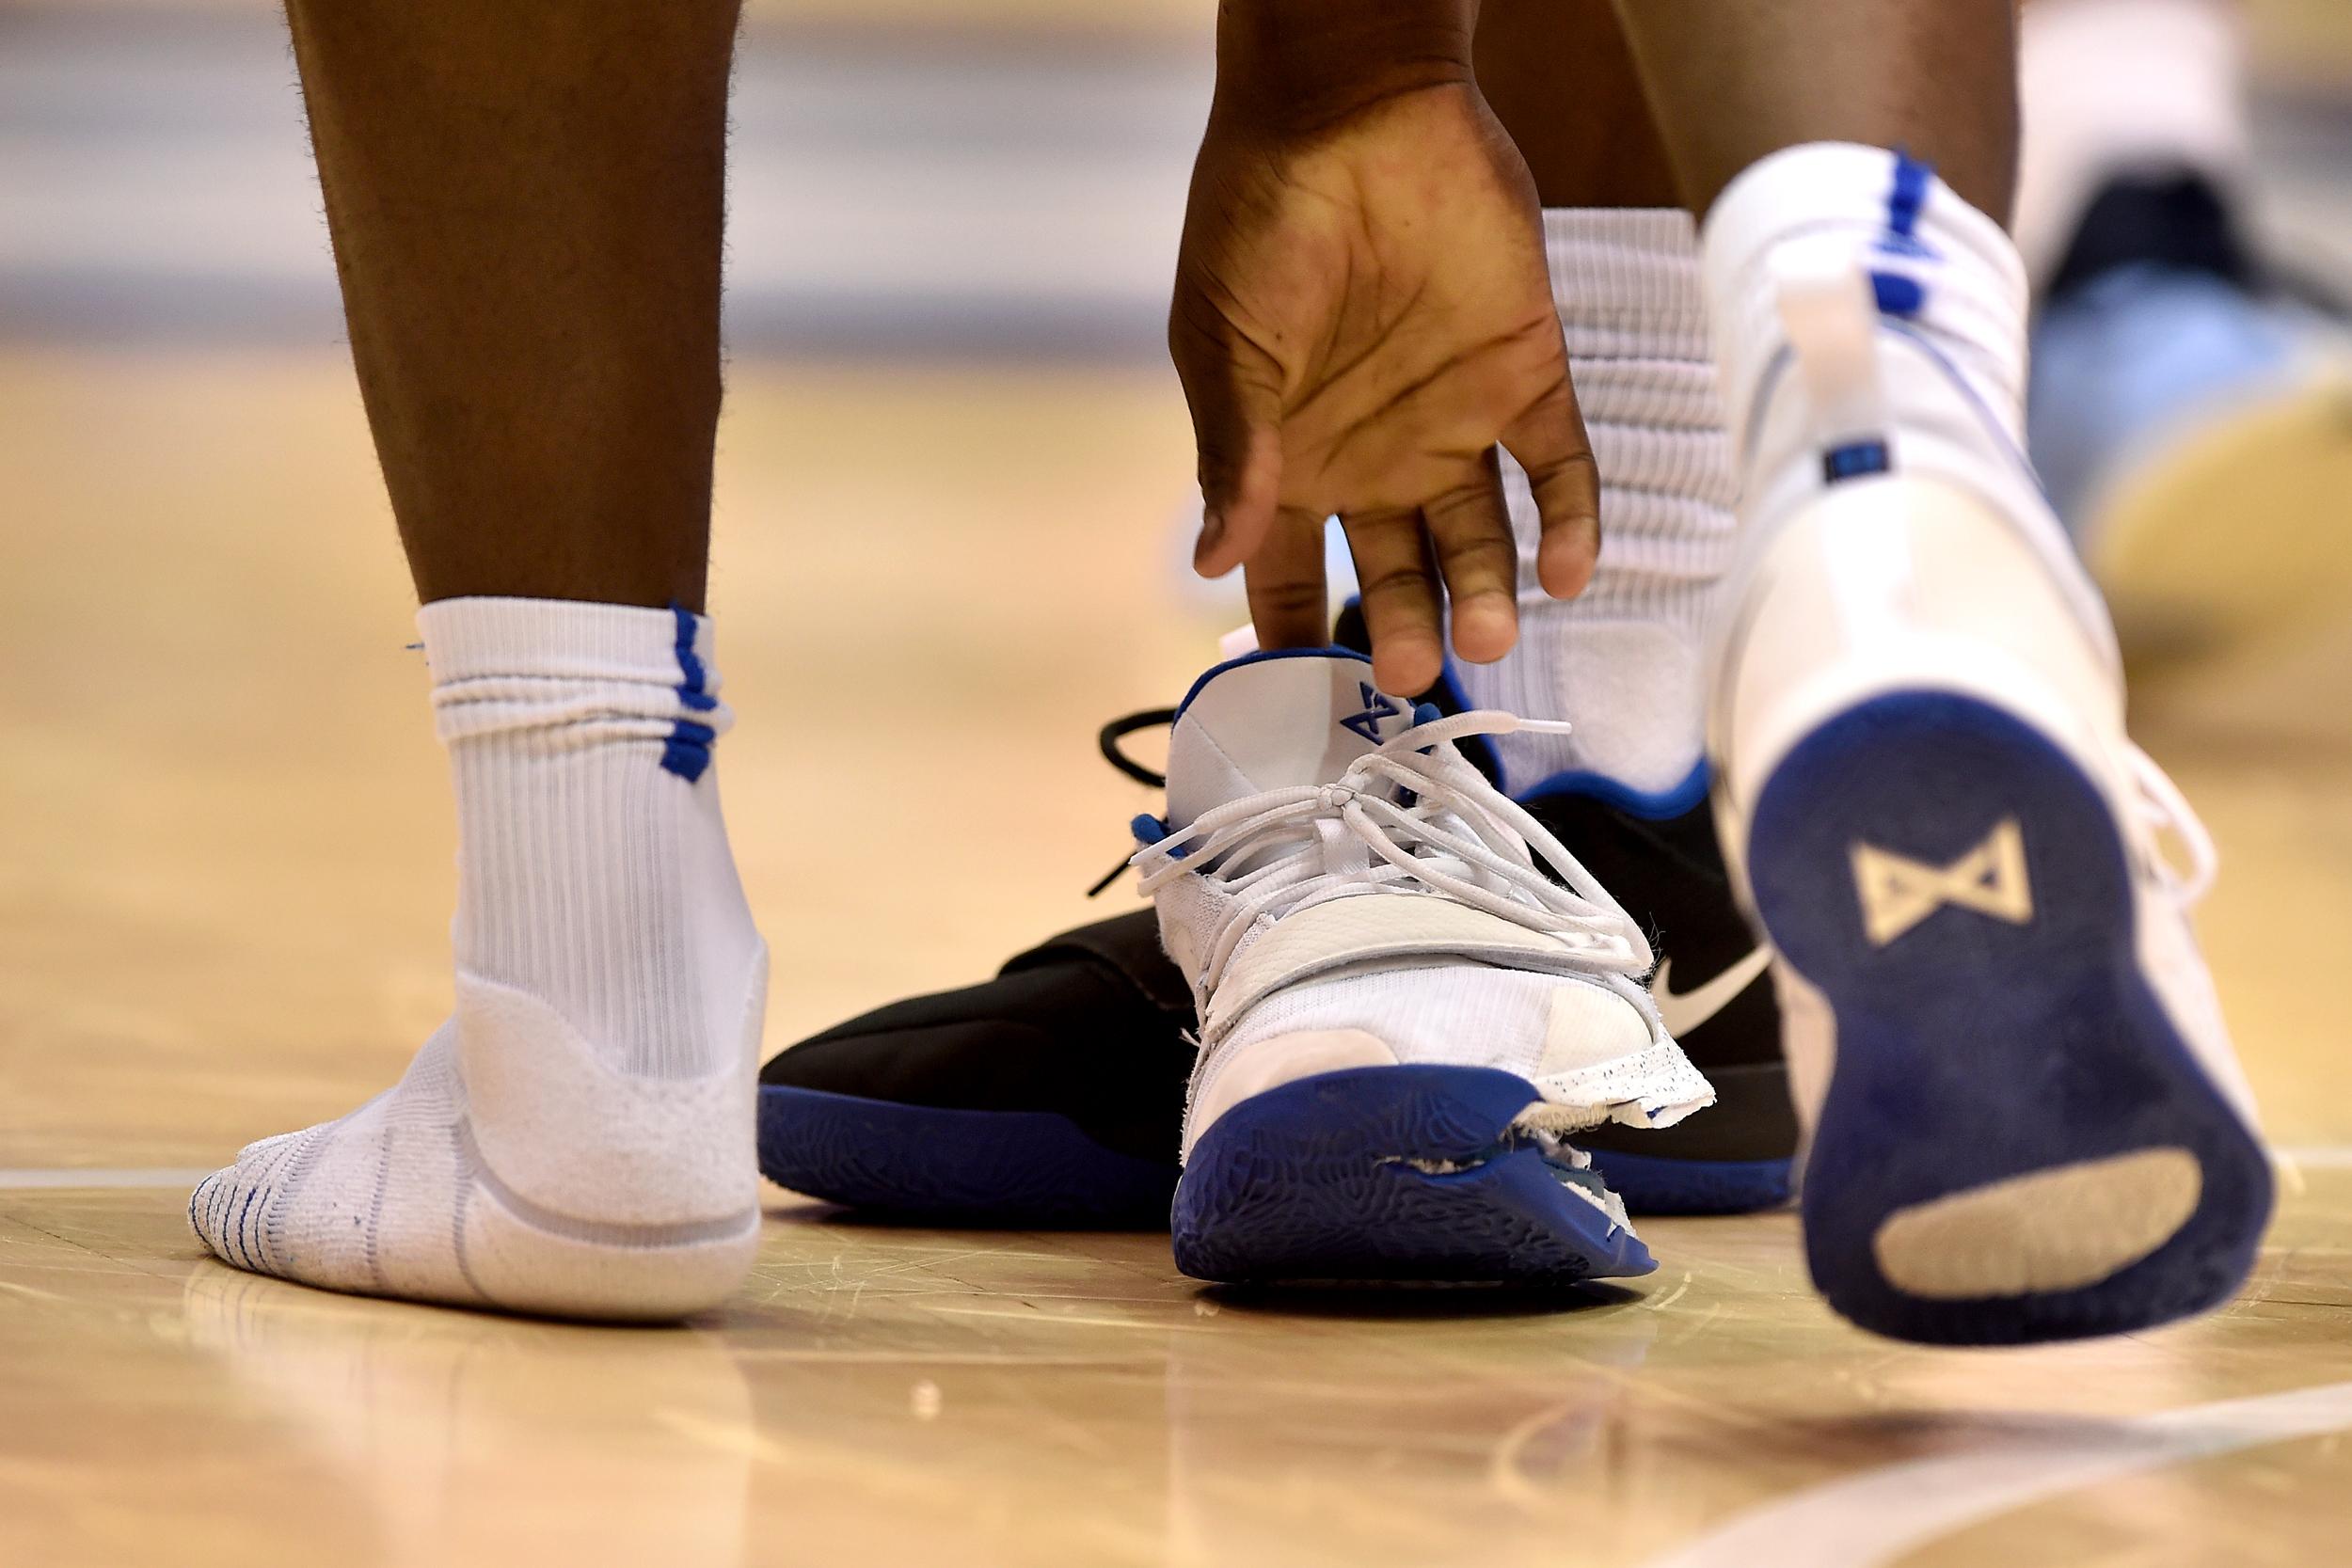 Zion Williamson sneaker malfunction